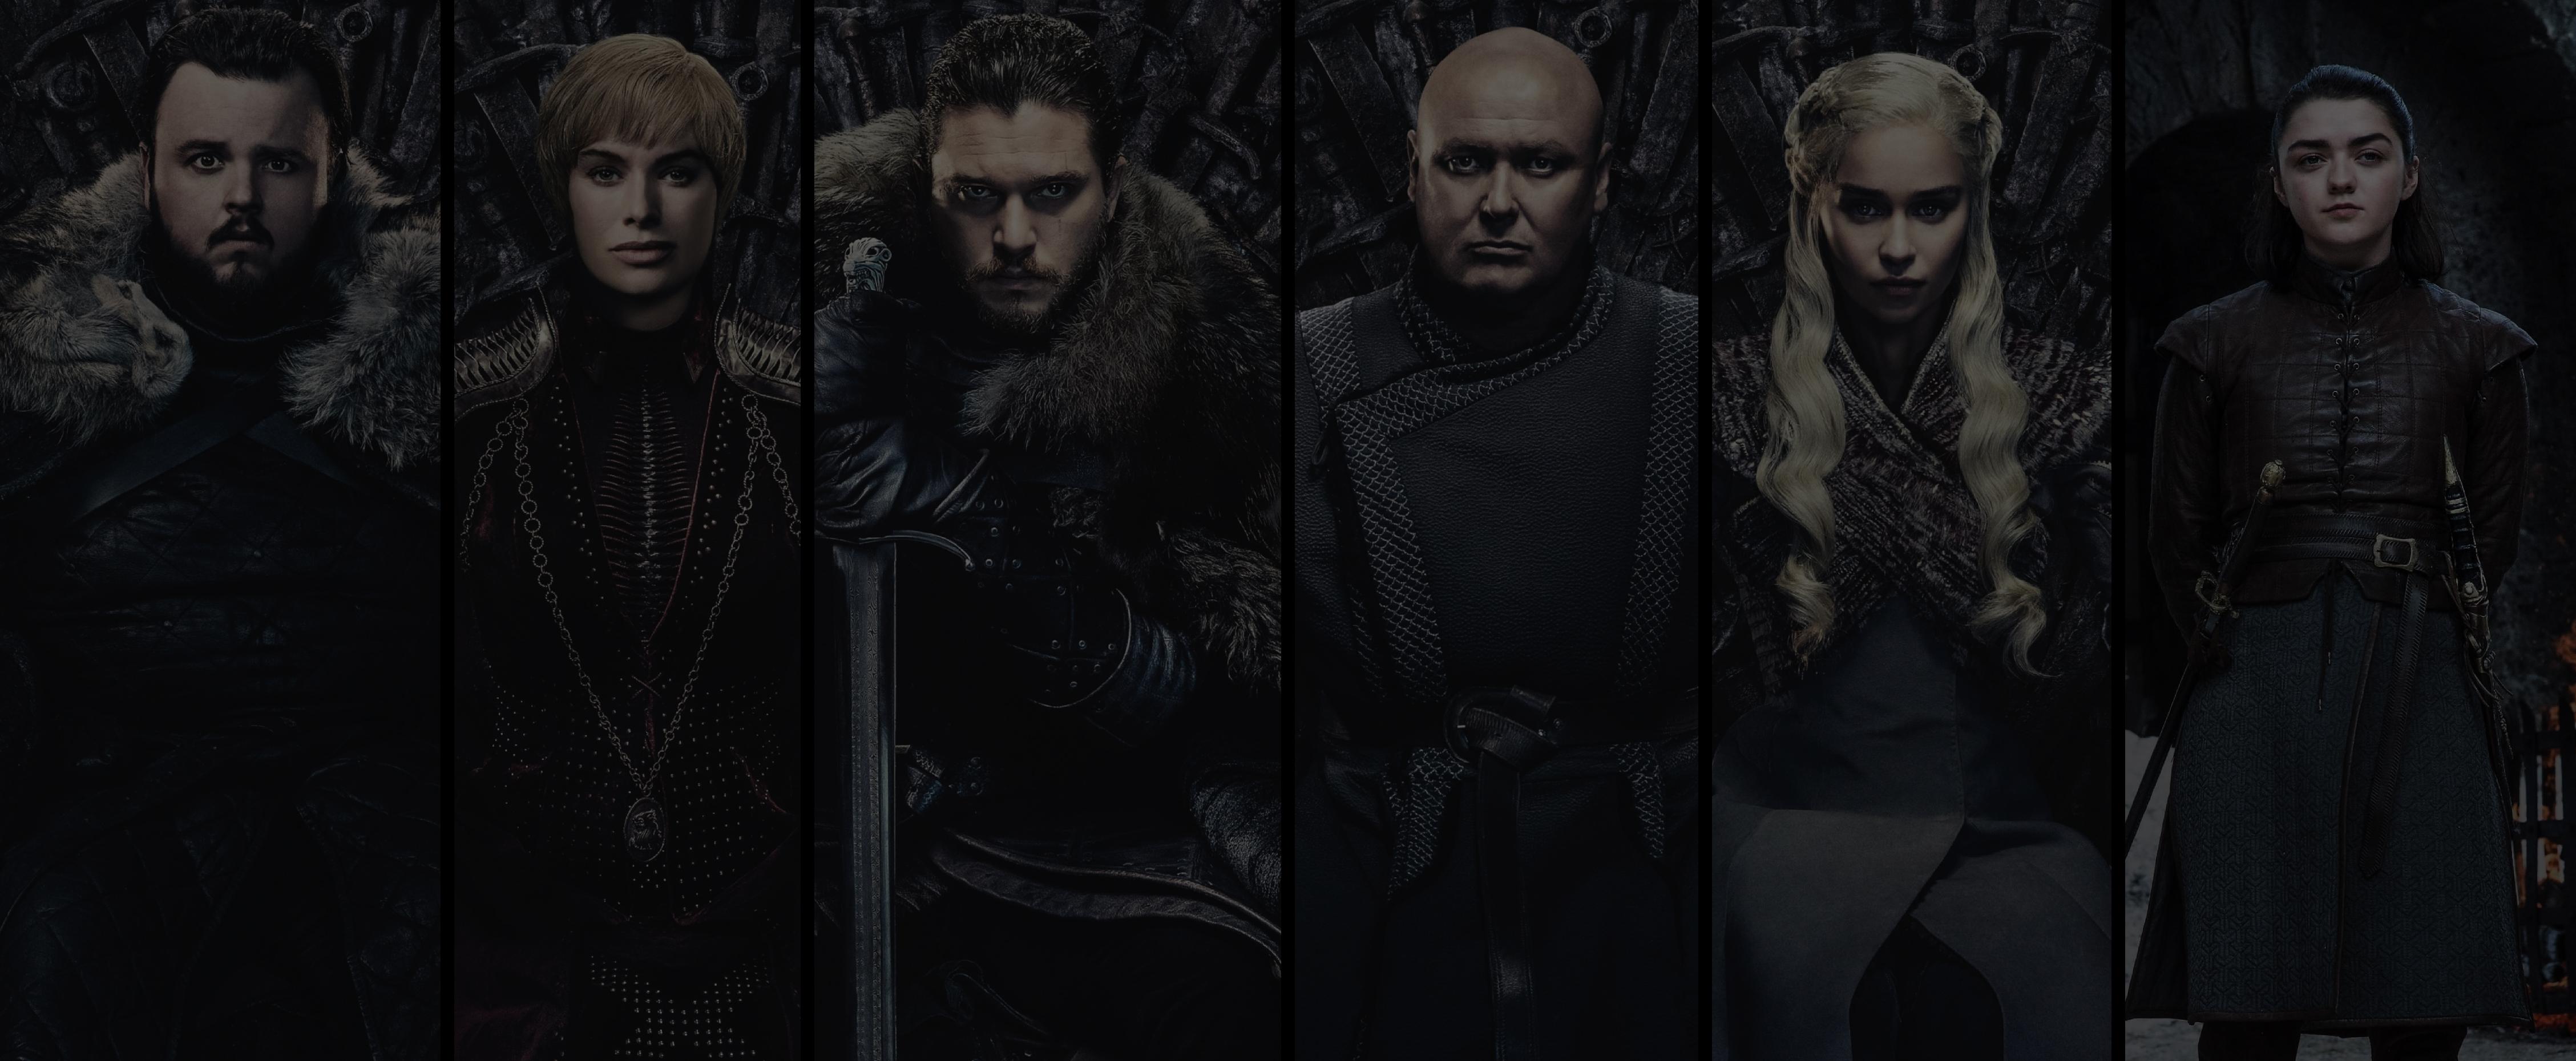 game-of-thrones-header